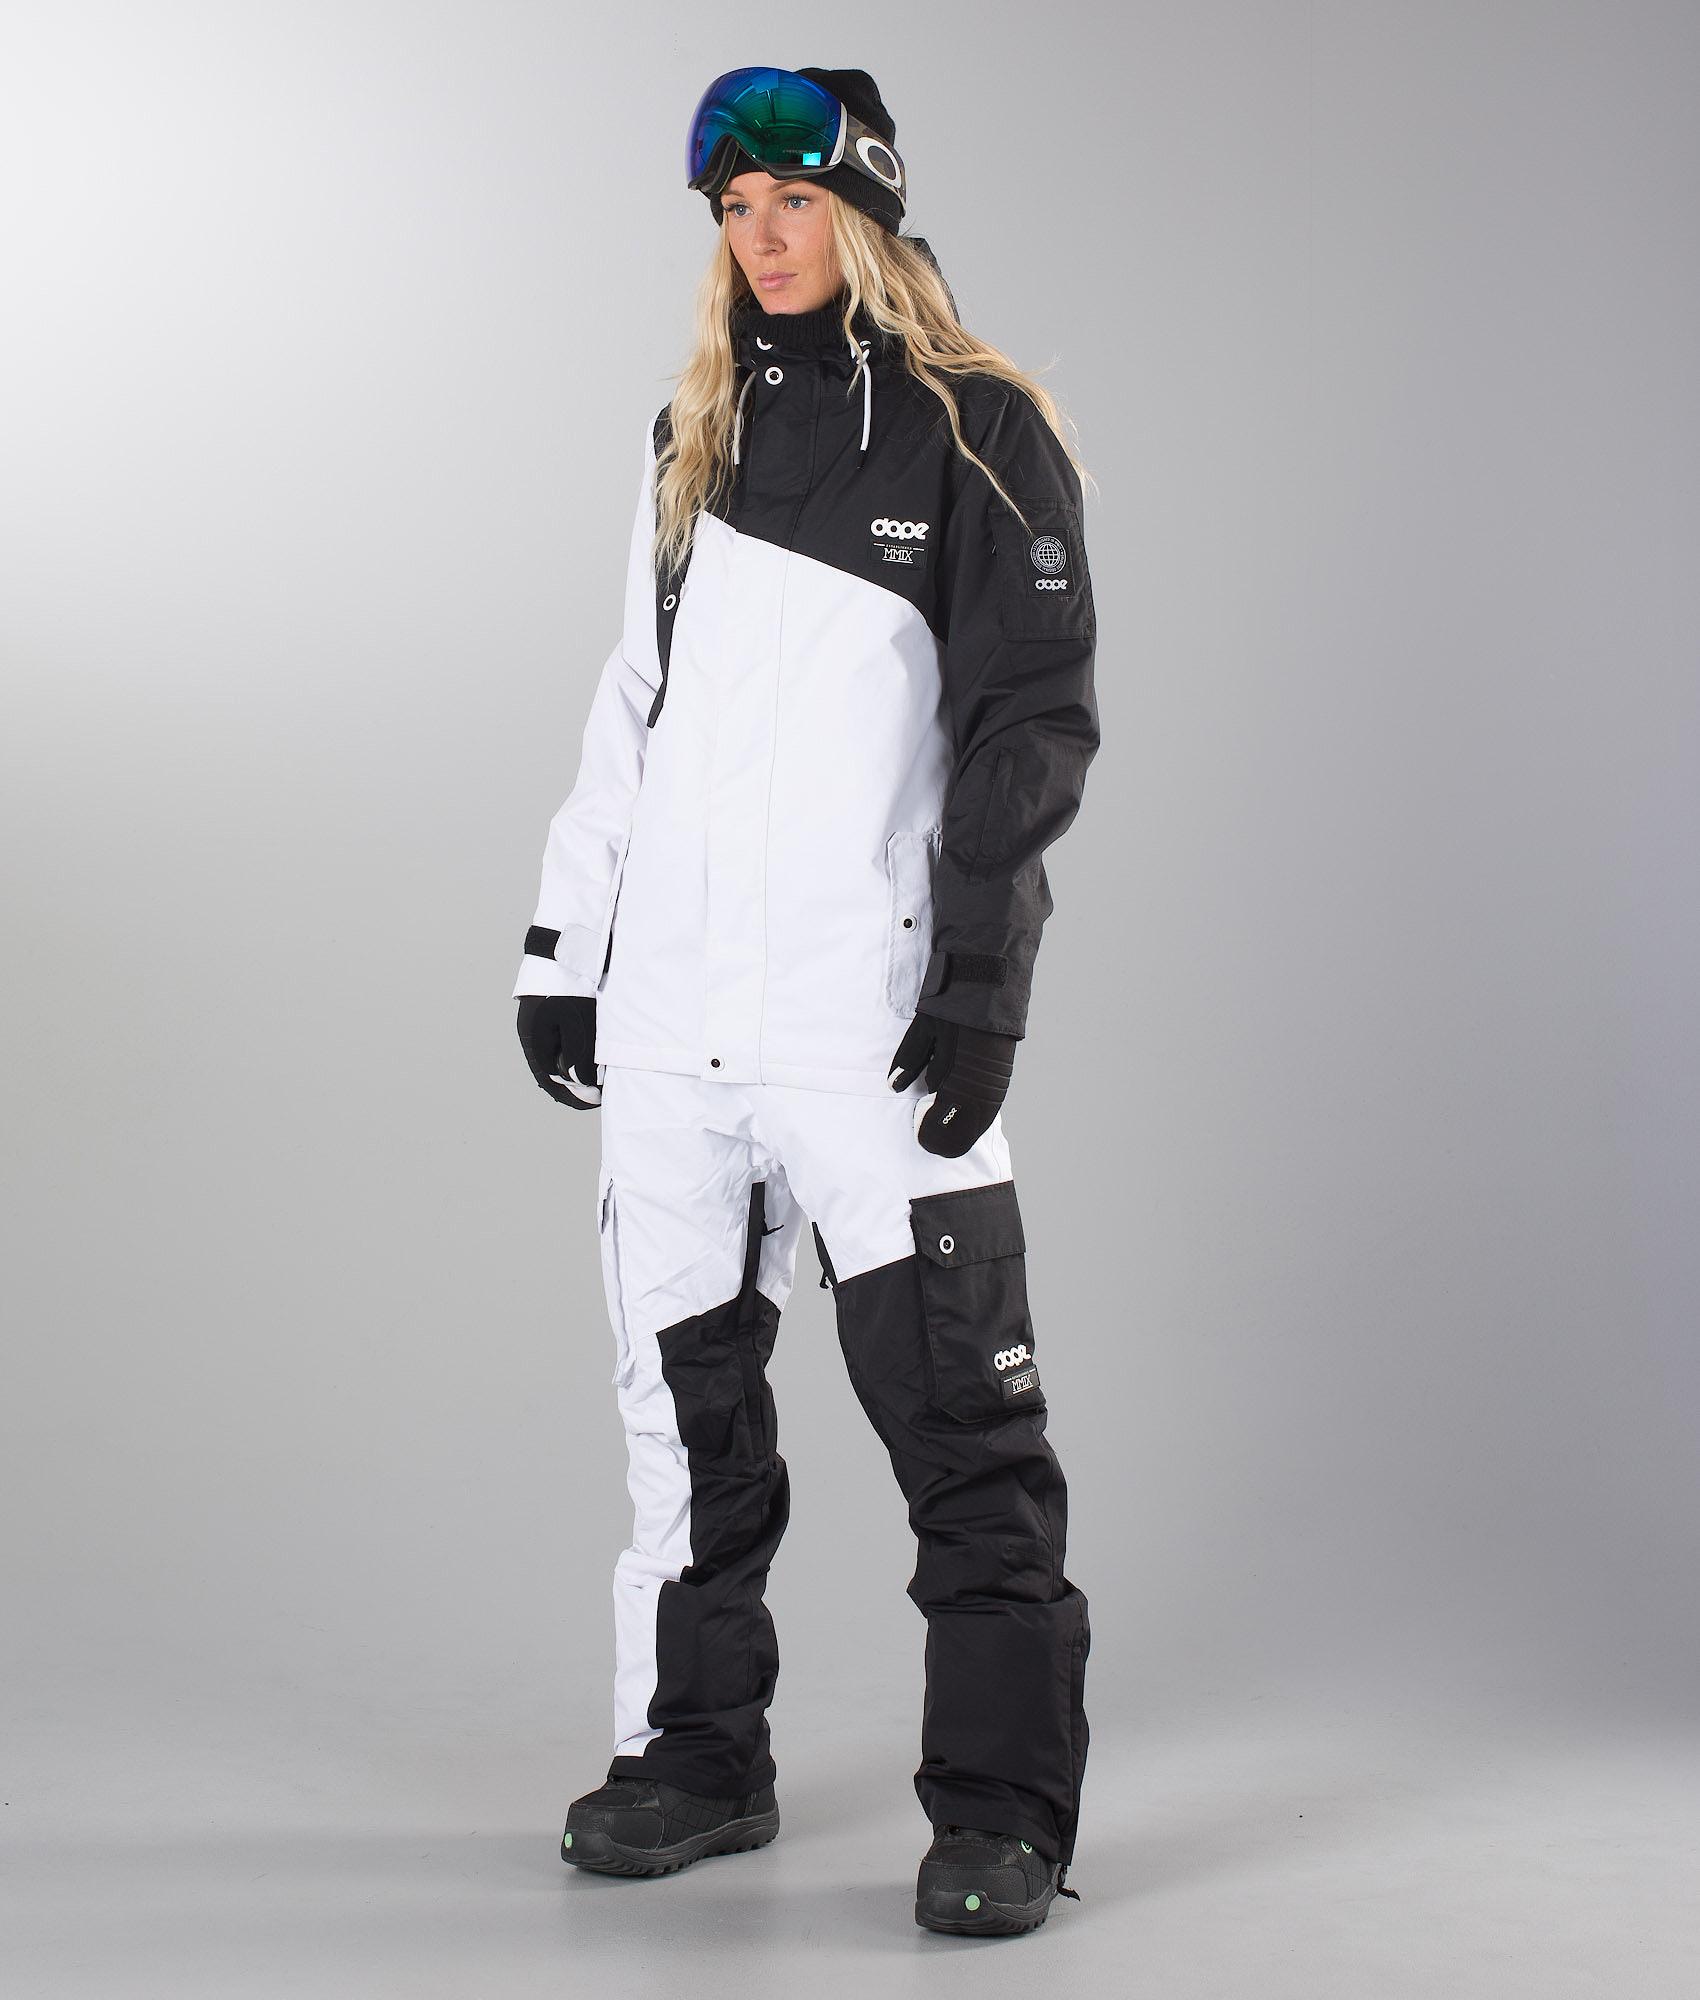 0681bf9cdb Dope Adept Unisex Snowboard Jacket Black White - Ridestore.com